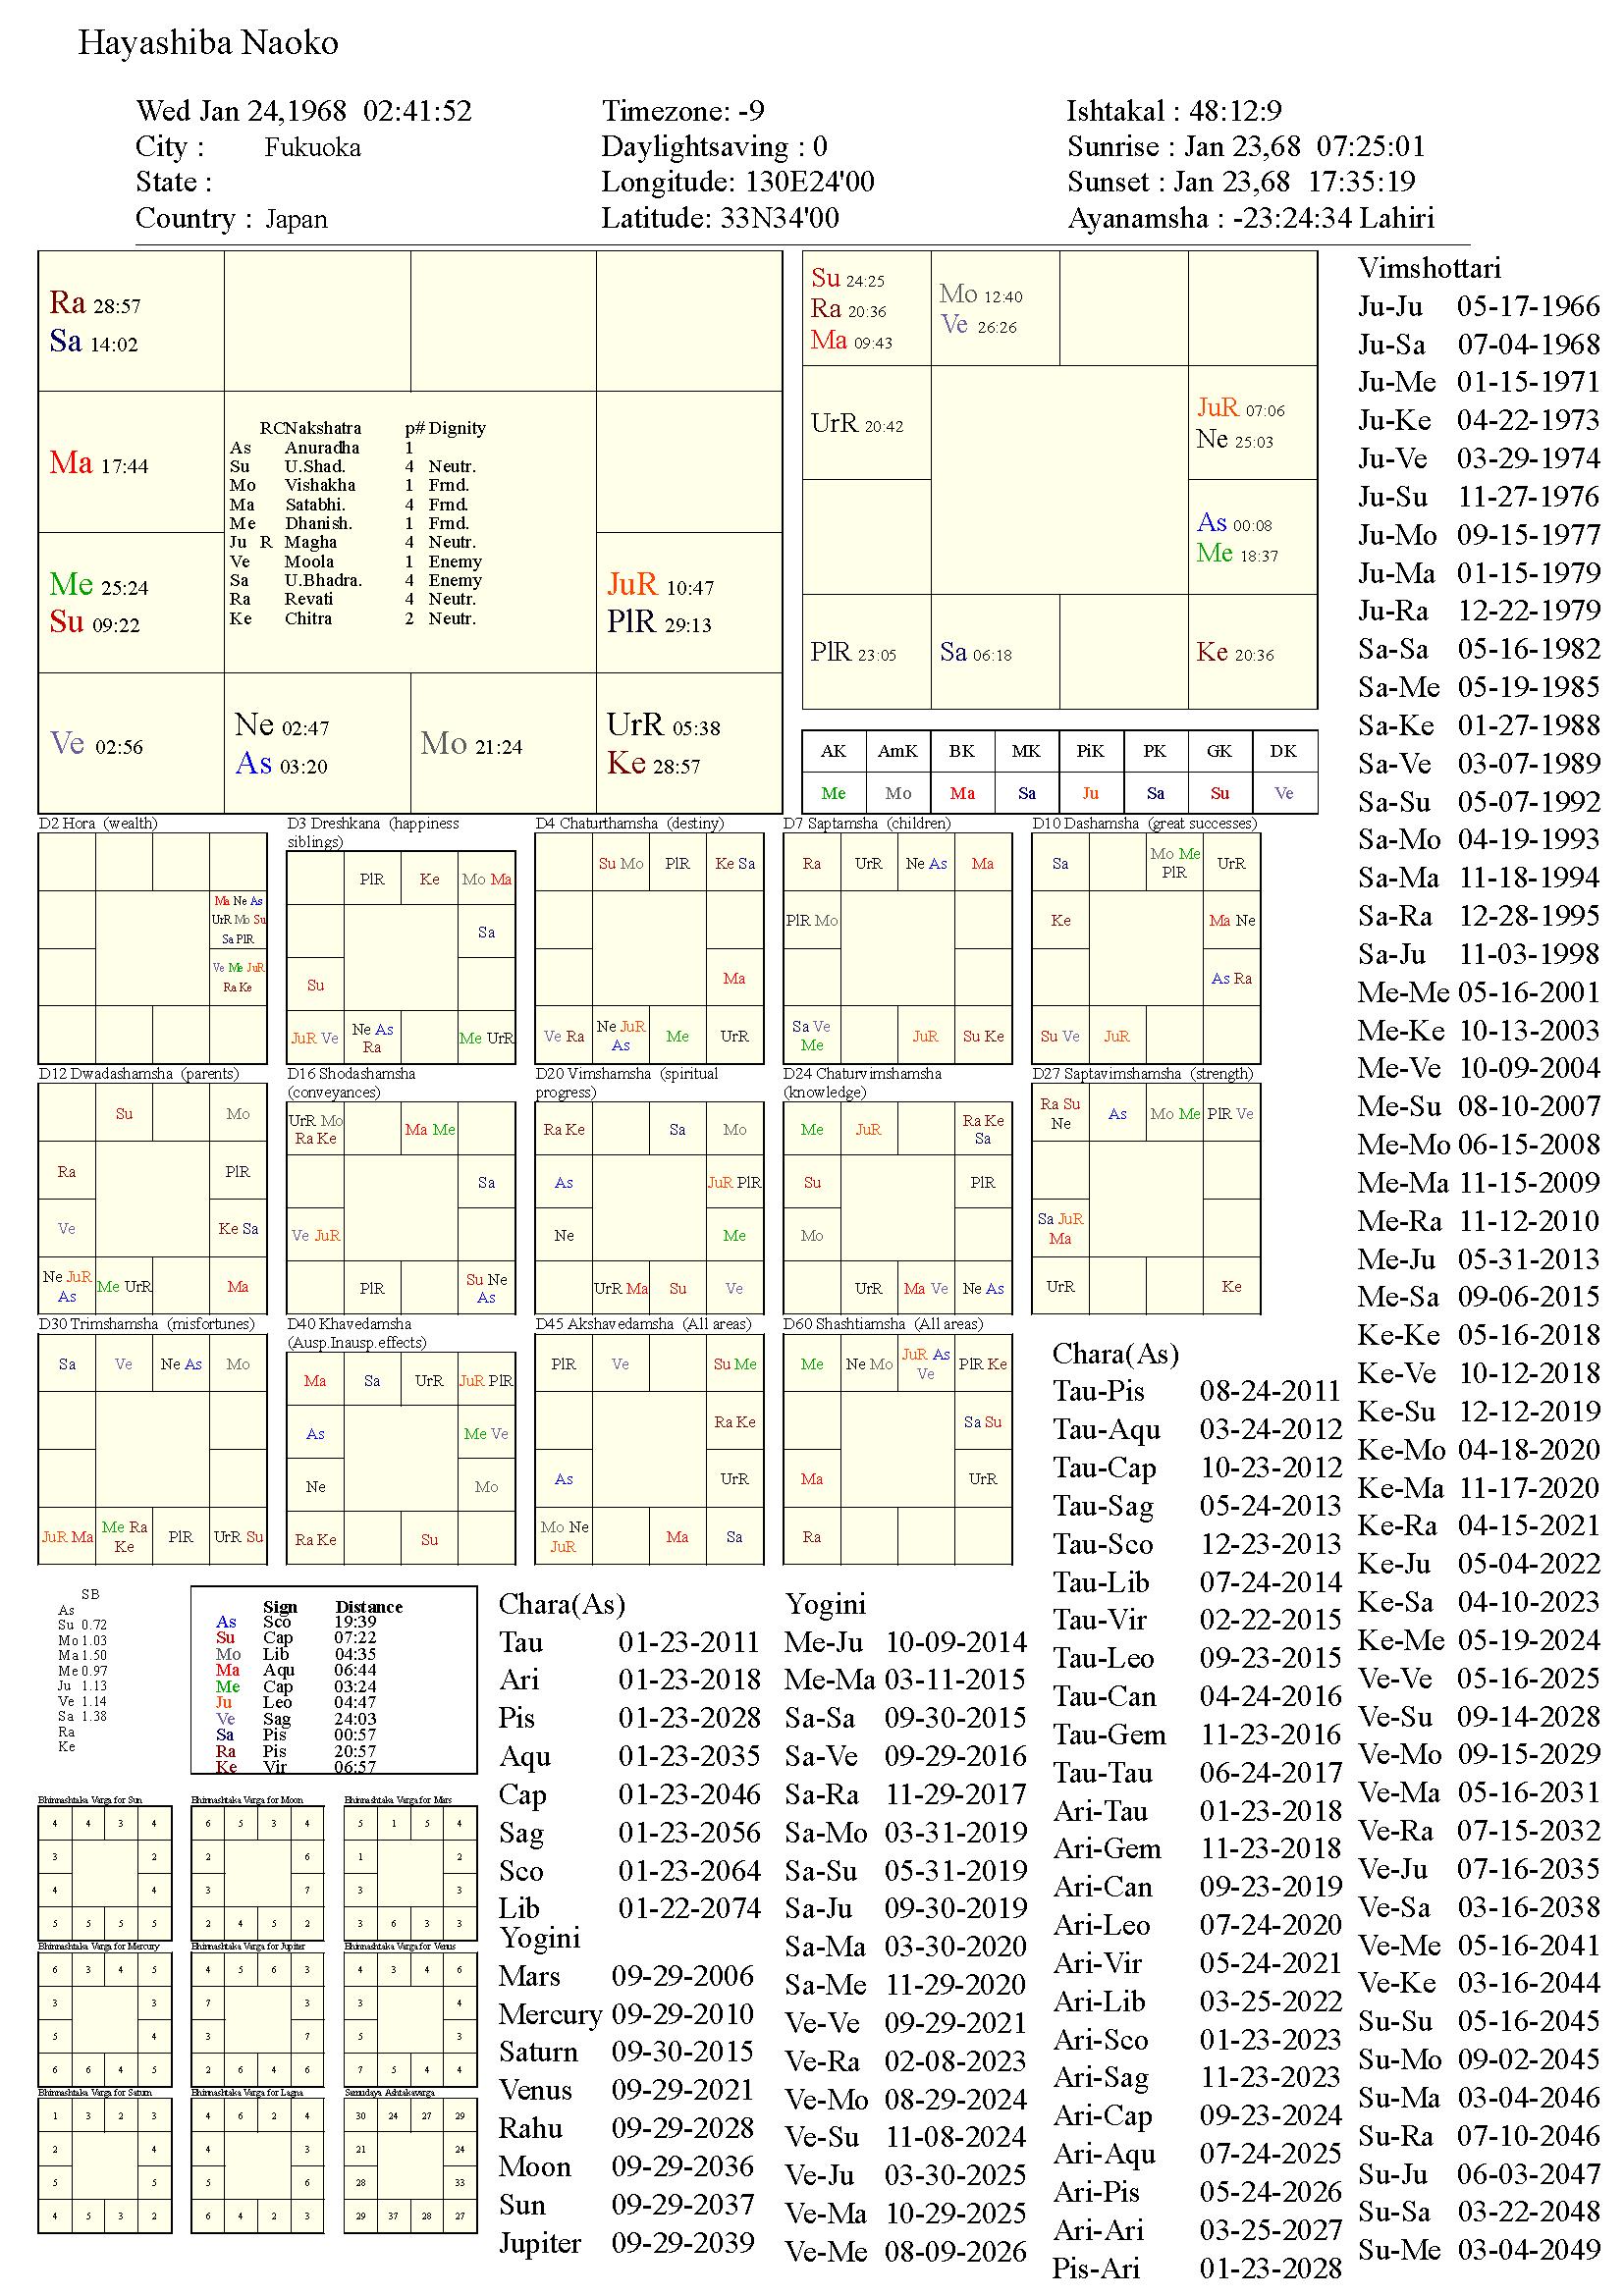 HayashibaNaoko_chart